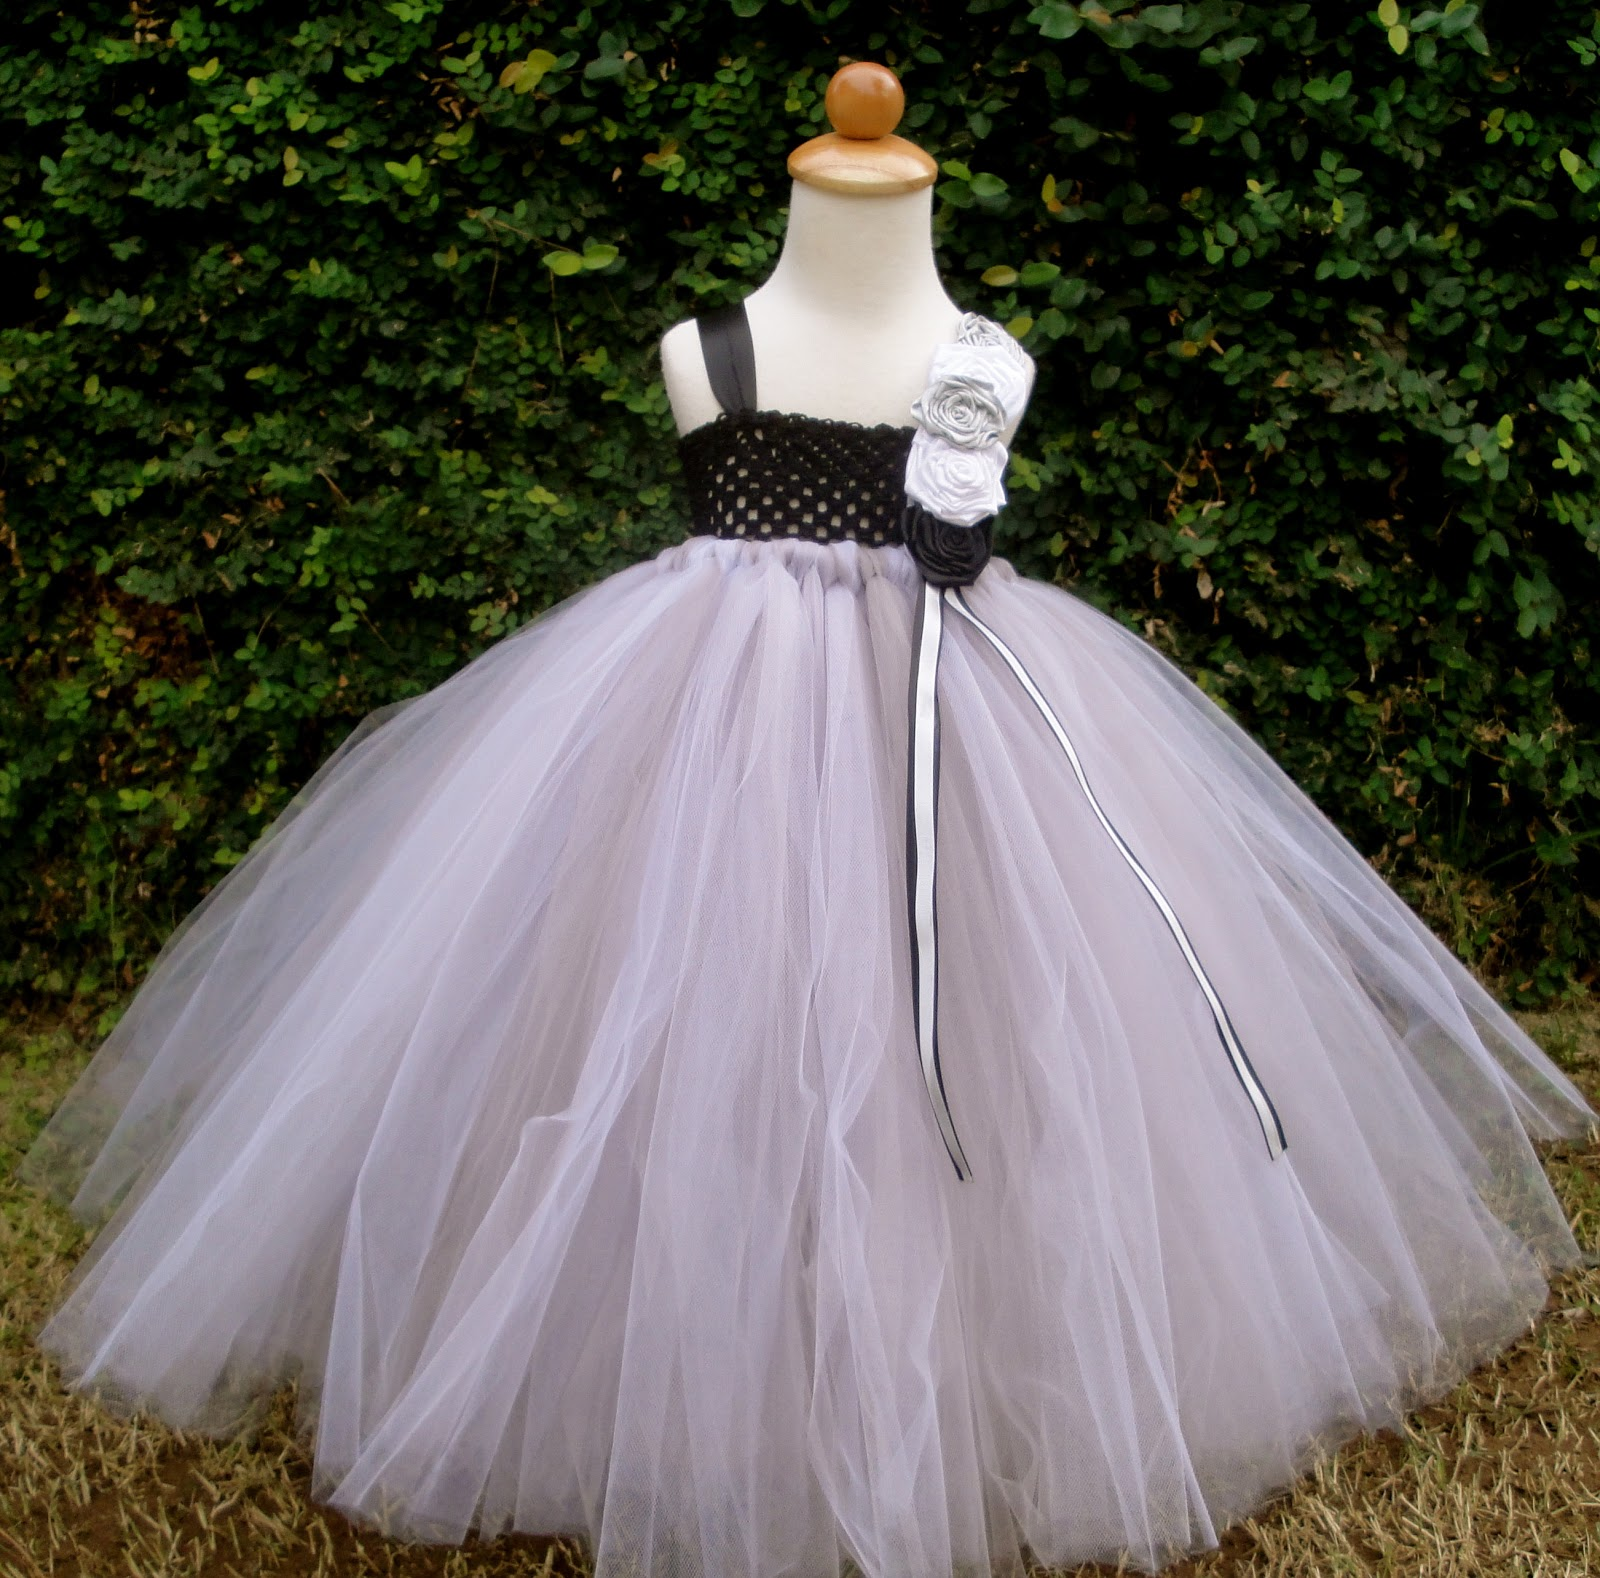 flower girl tutu dresses silver black and white flower girl tutu dress